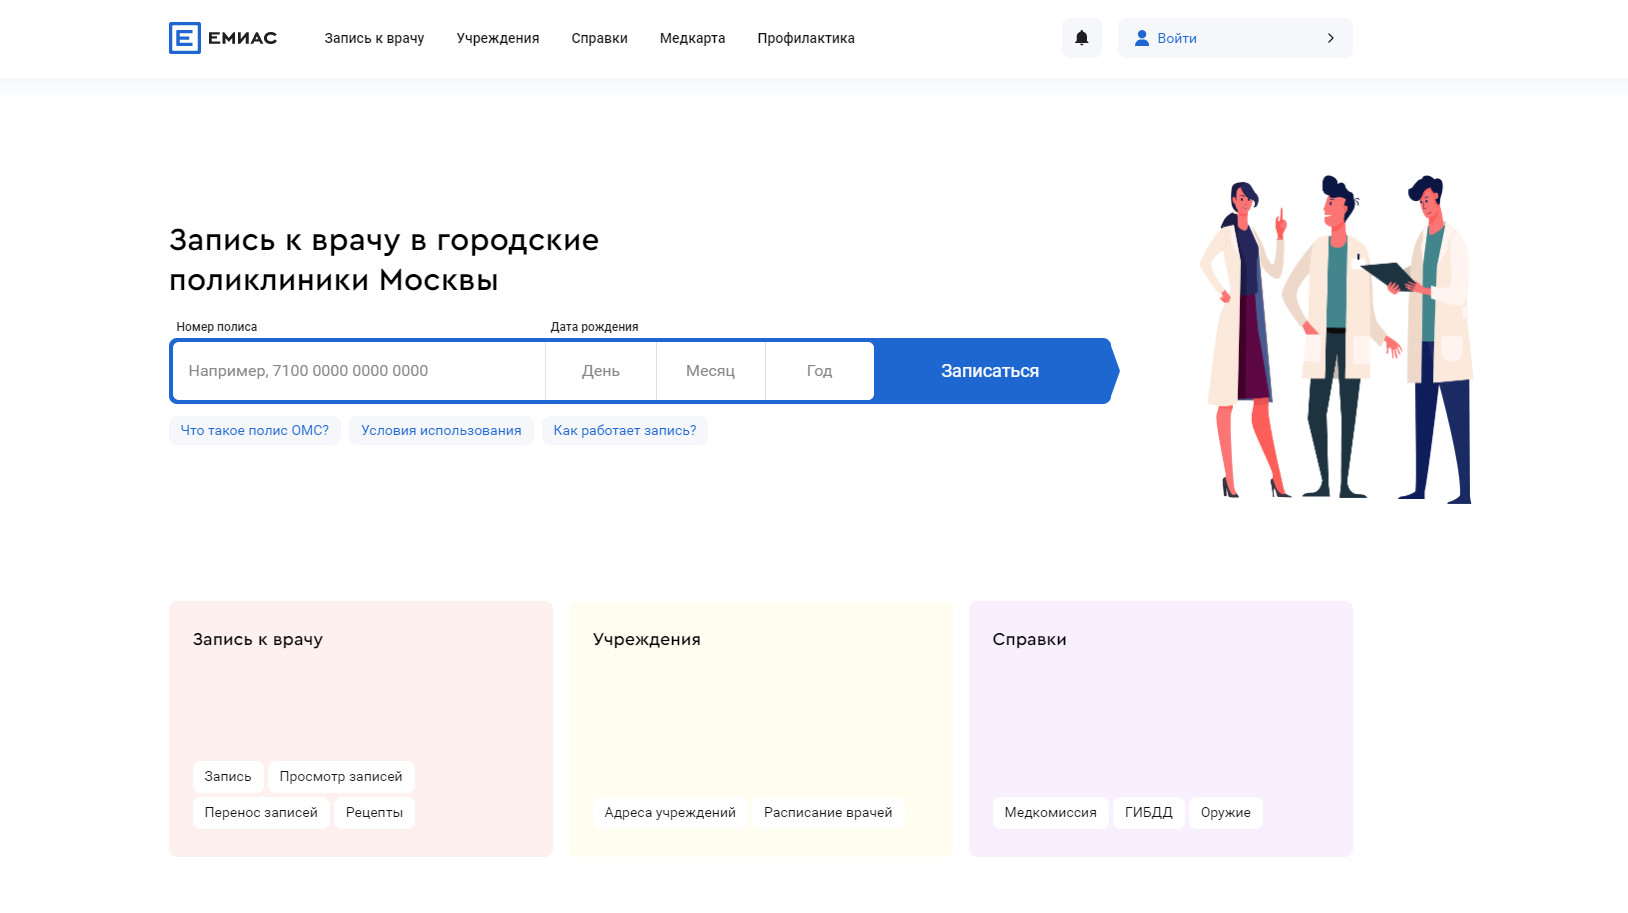 Емиас Мос Ру - emias mos ru